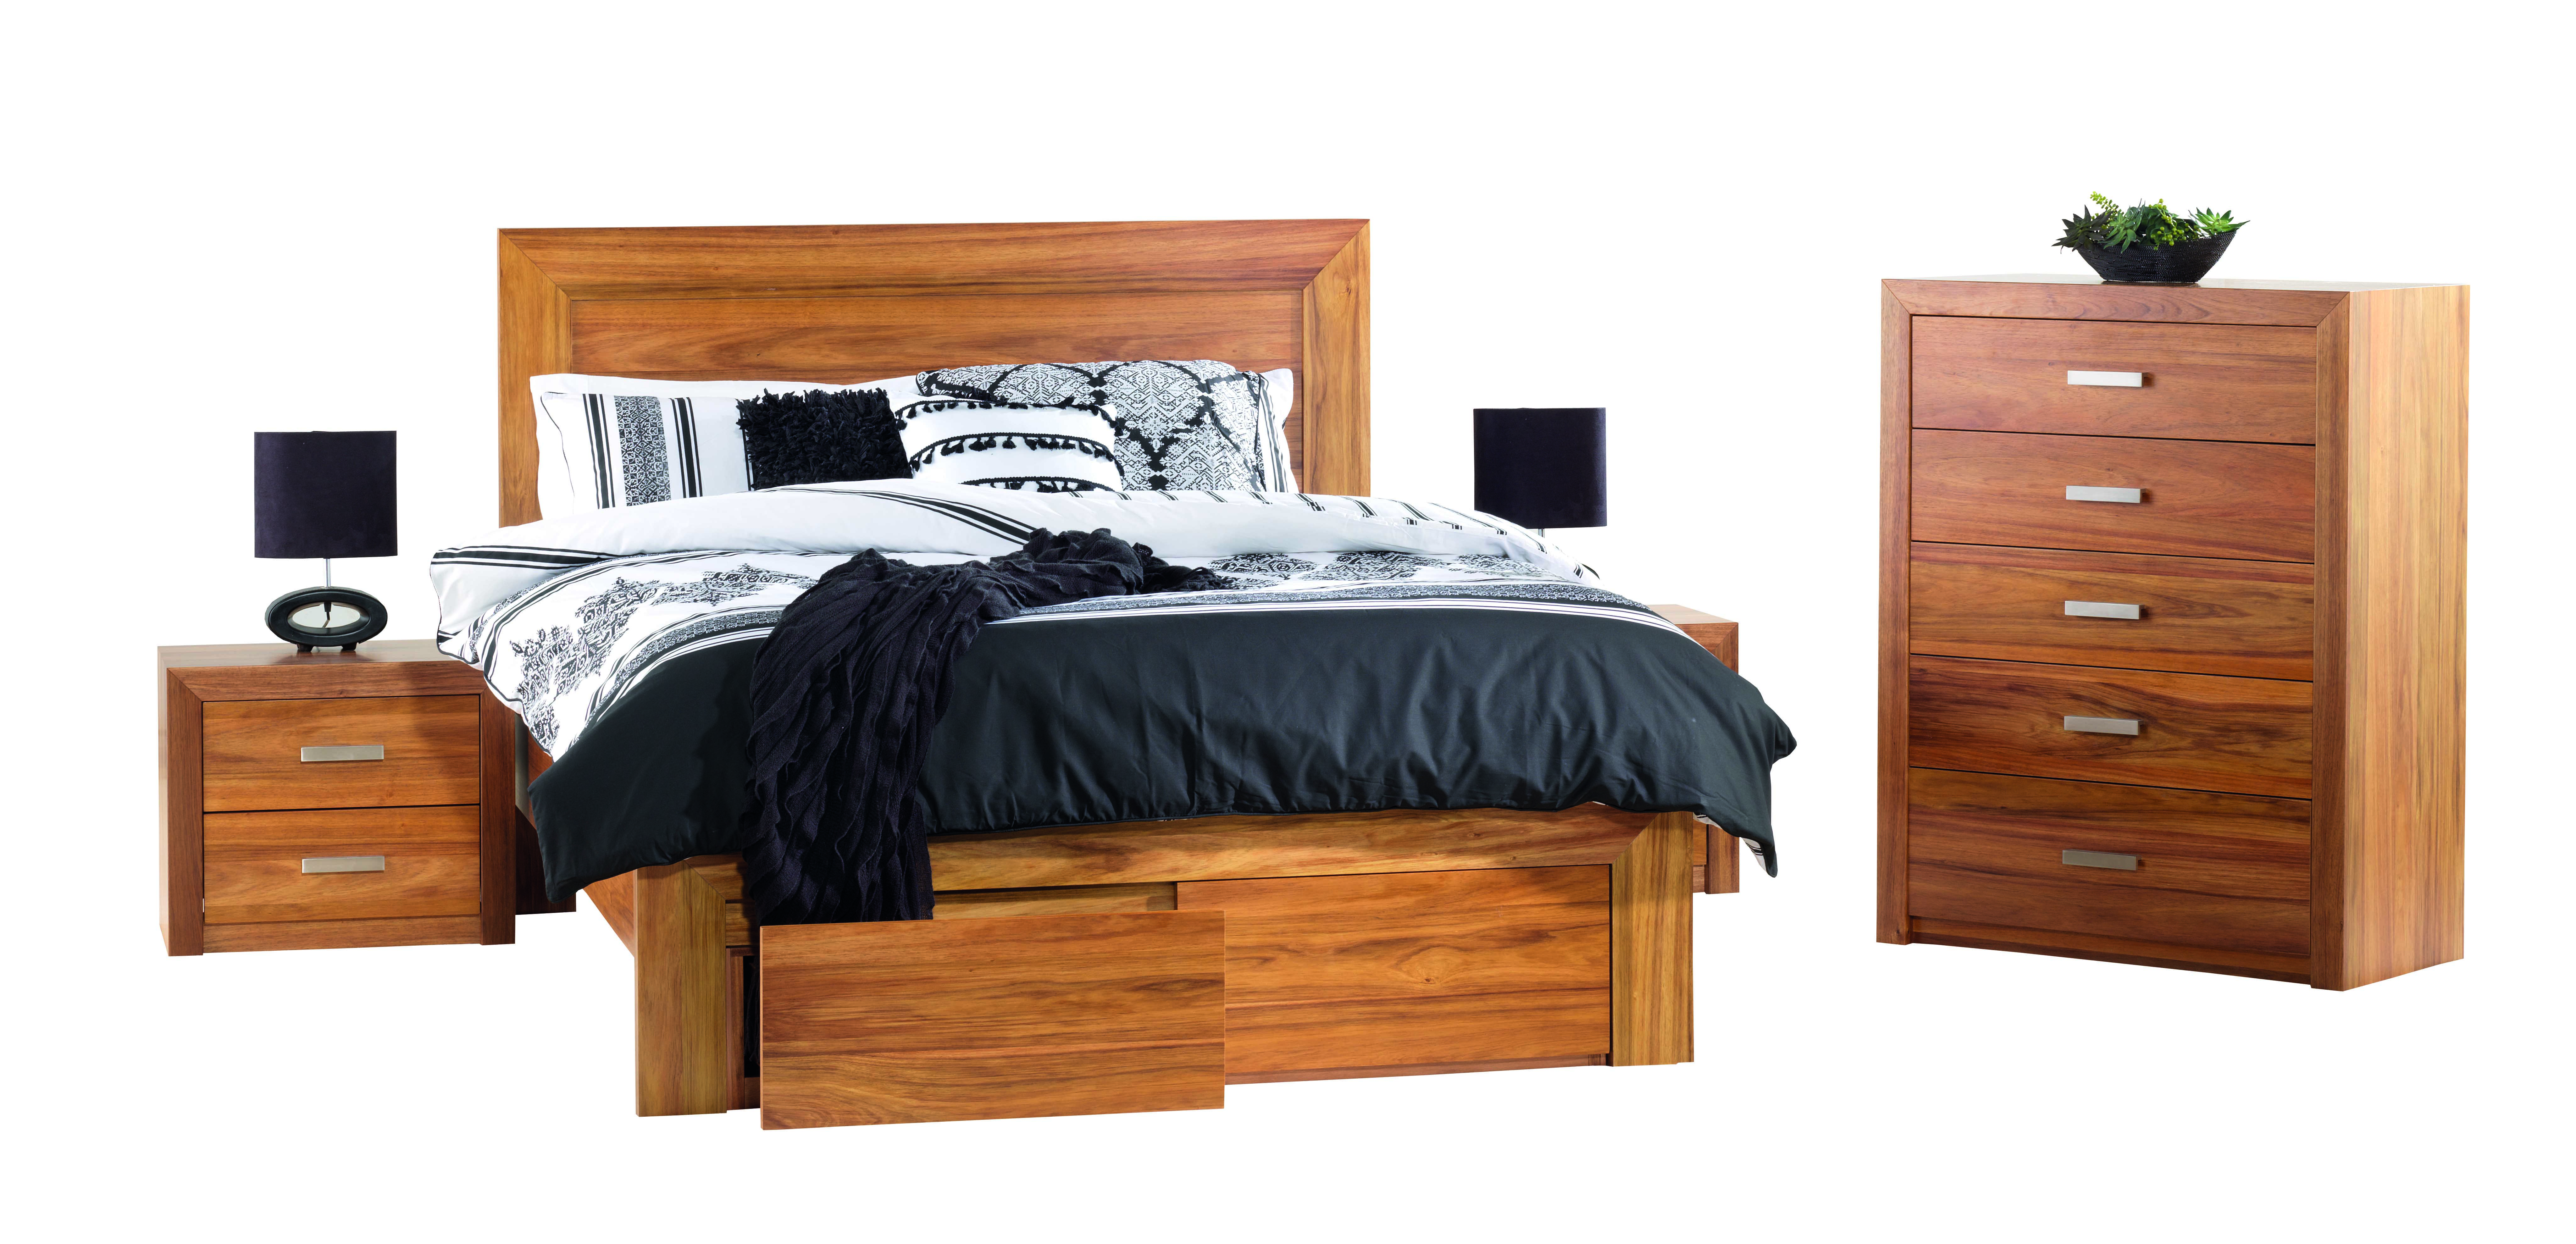 Blackwood bedroom suite solid blackwood bedroom suite for Cheap modern furniture australia